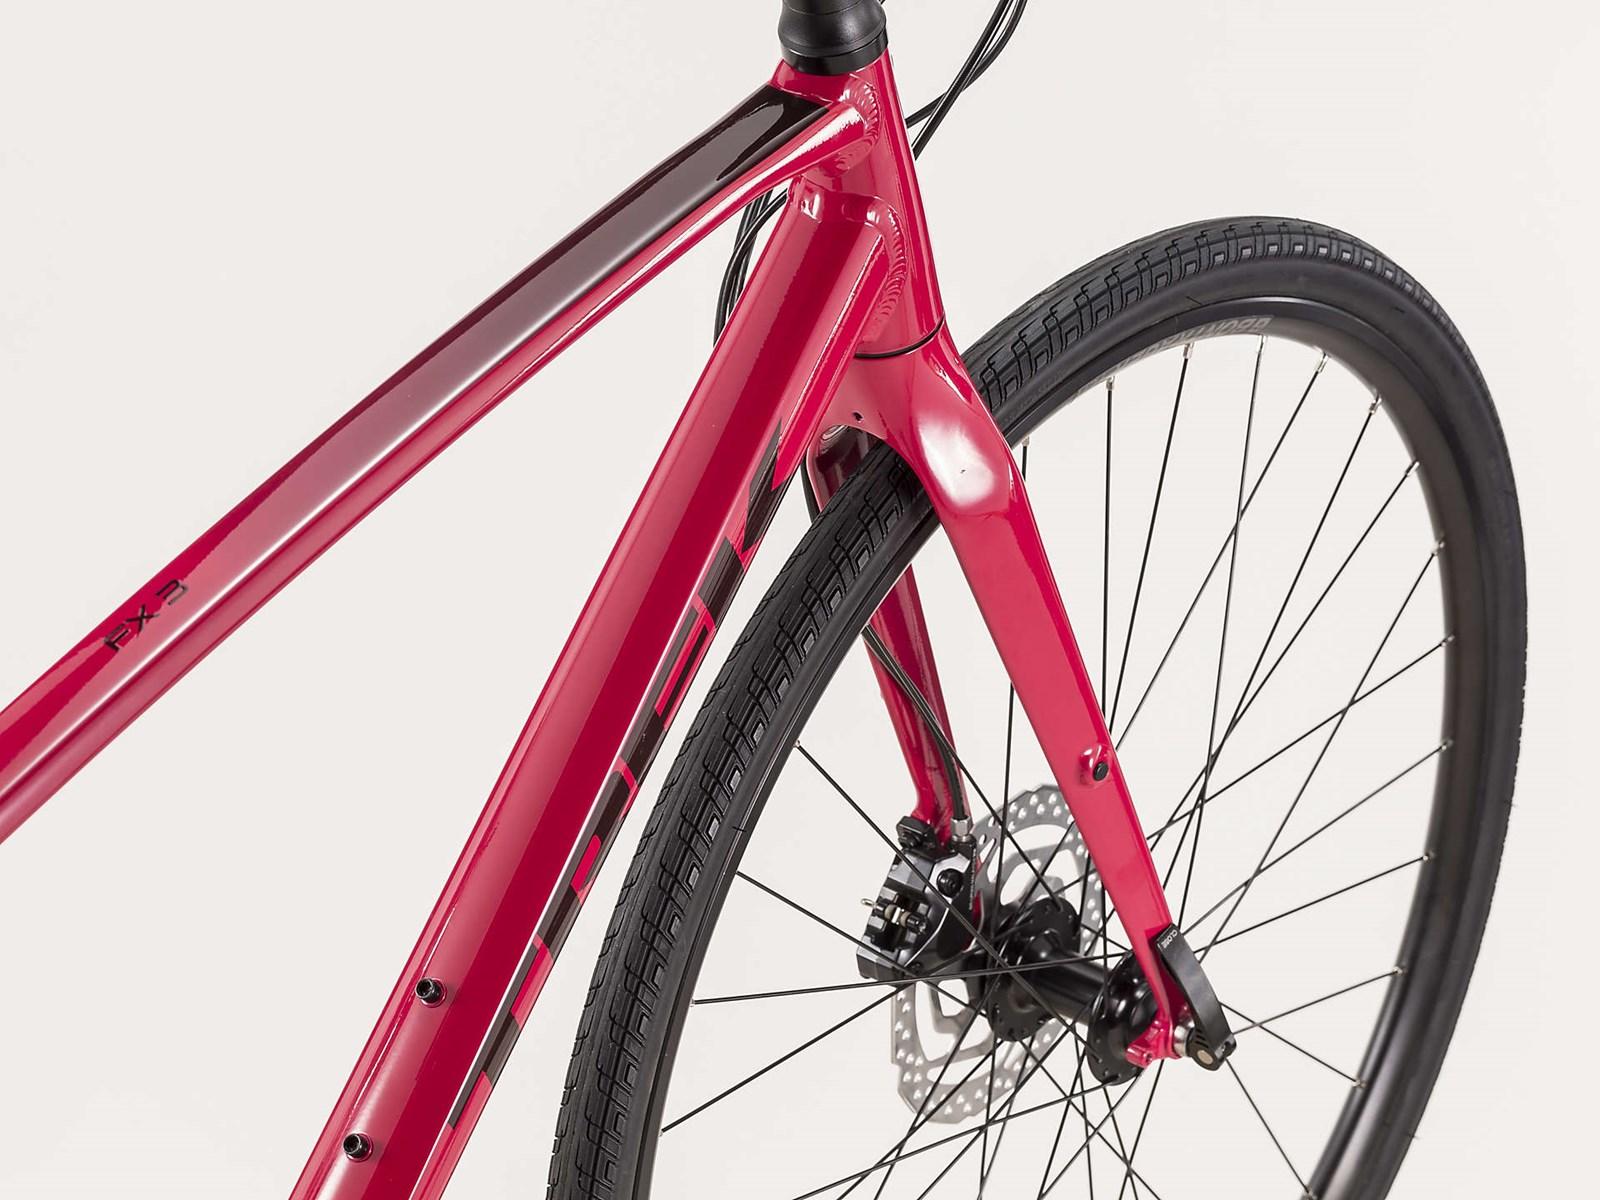 Trek Fx 3 Disc Womens City Bike 2020 Magenta 163 650 00